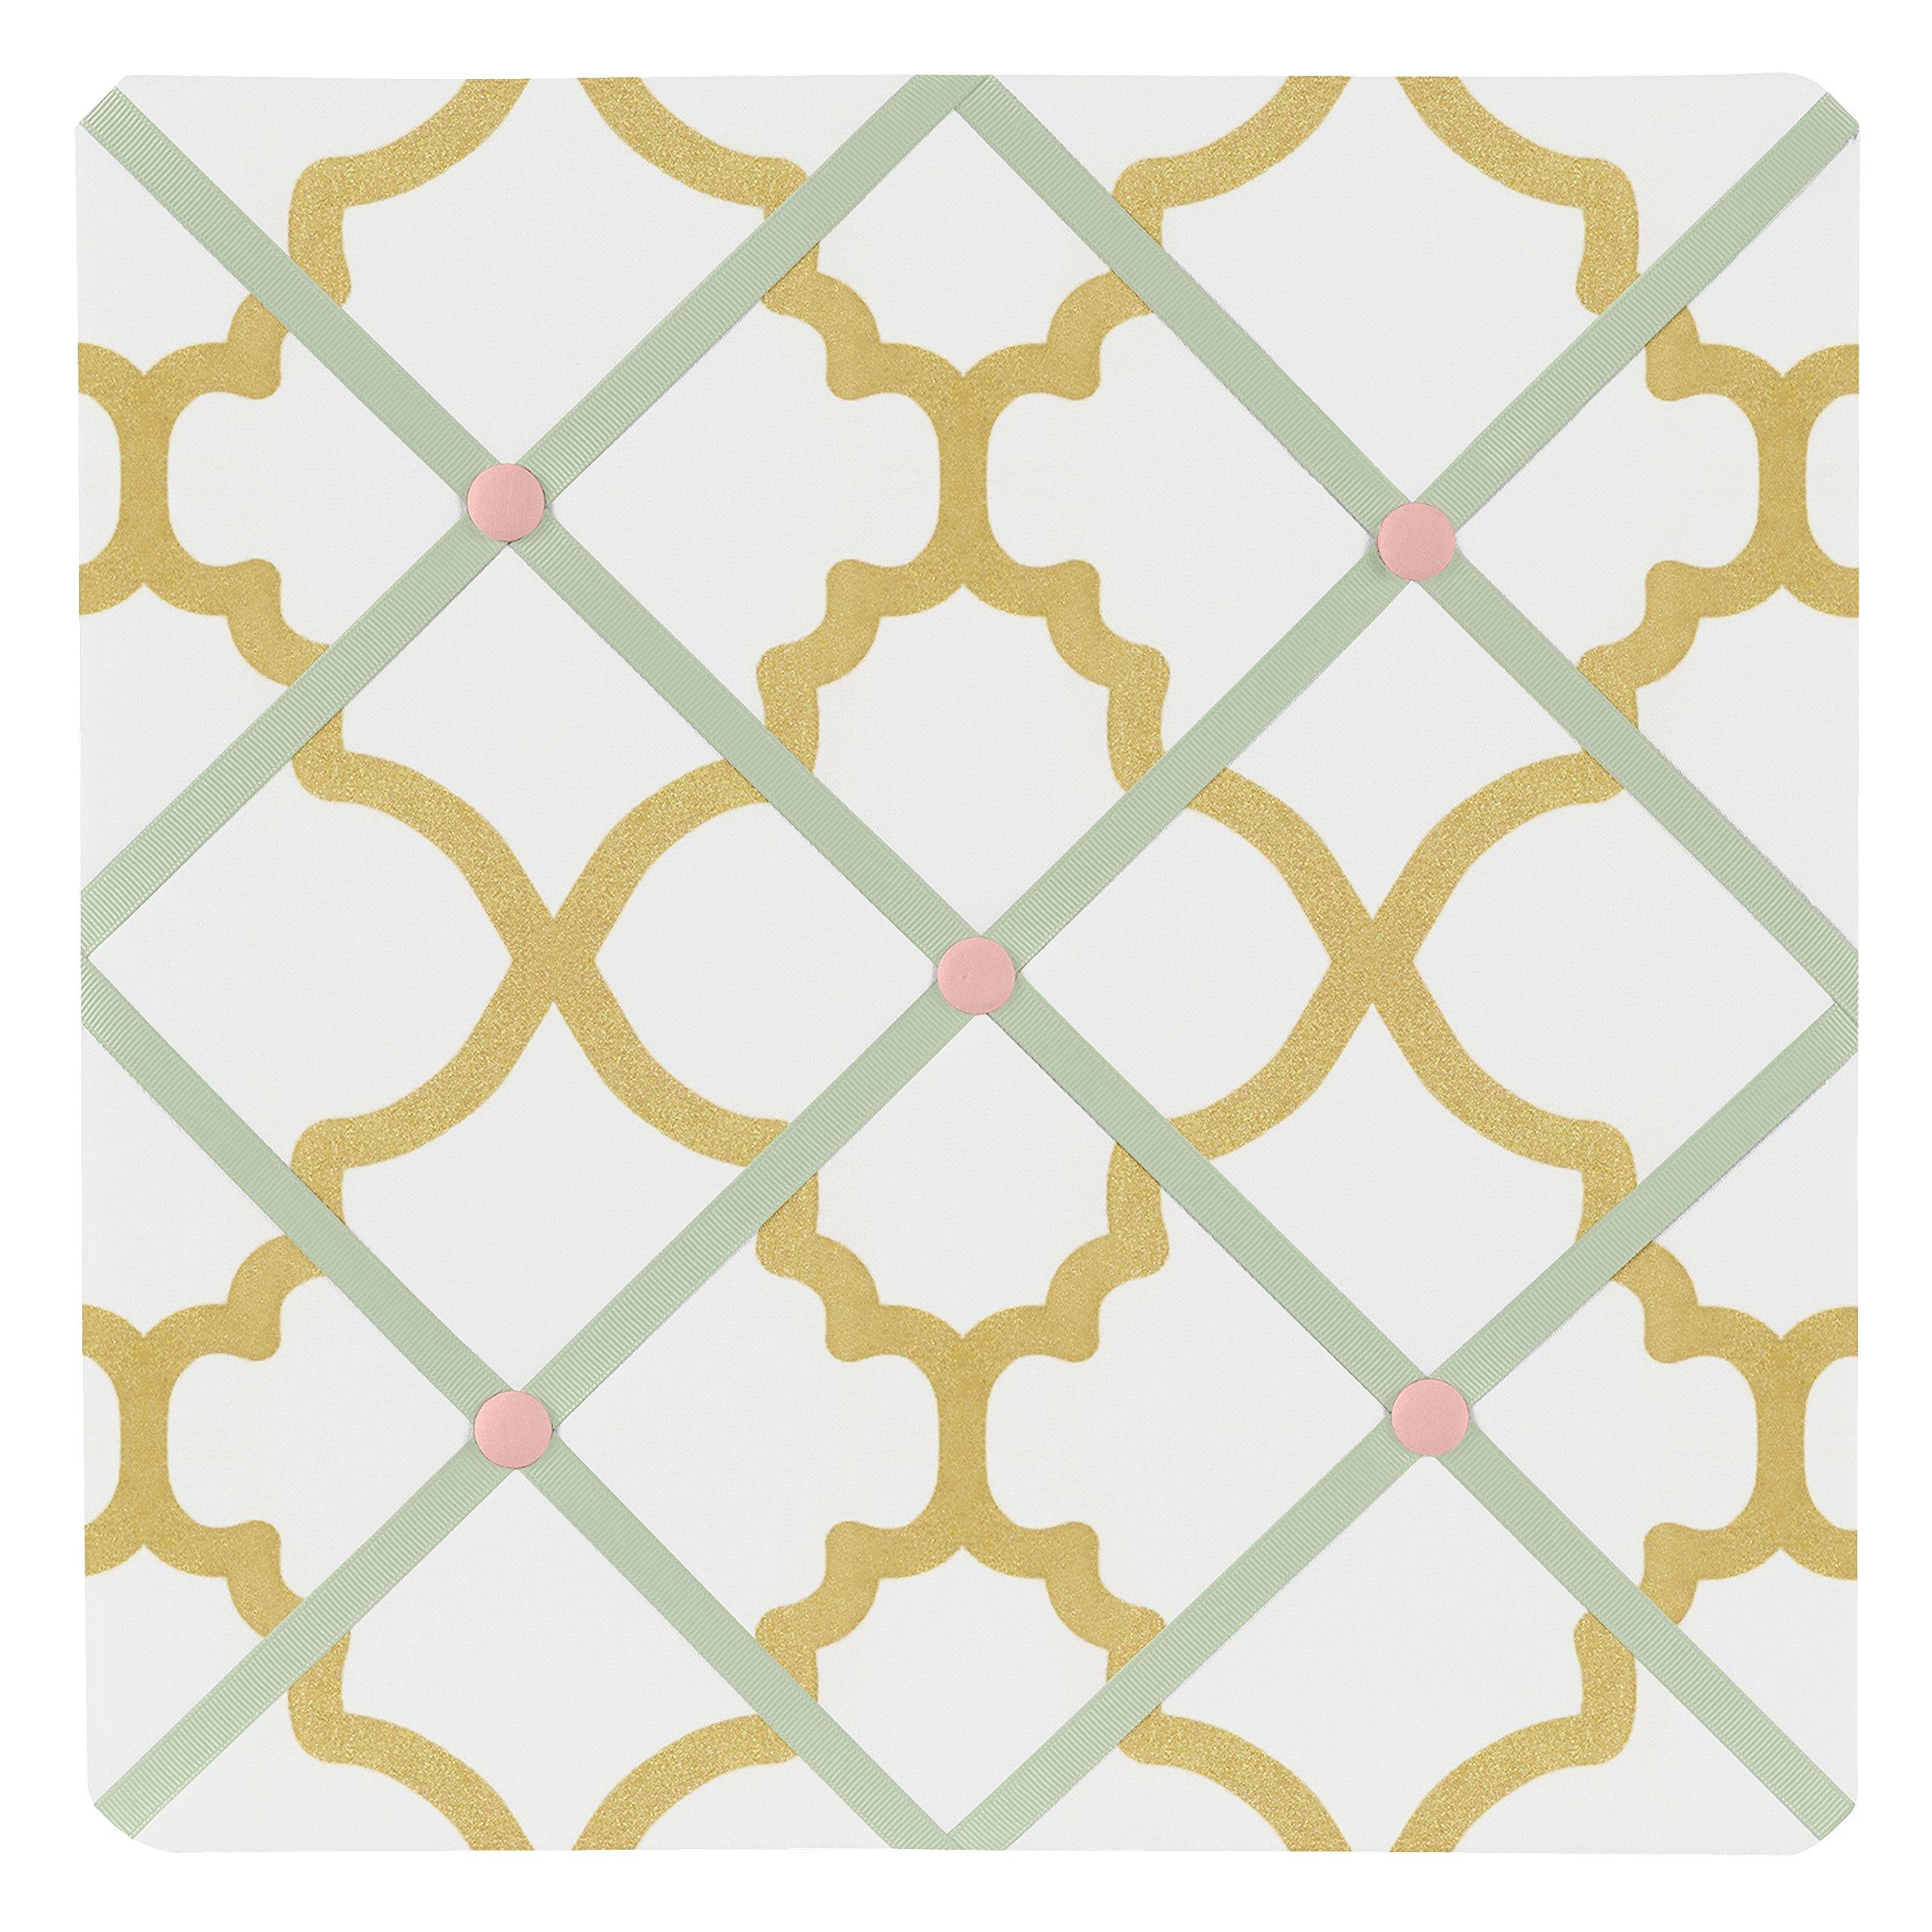 Sweet Jojo Designs Ava Mint Coral White and Gold Trellis Fabric Memory/Memo Photo Bulletin Board